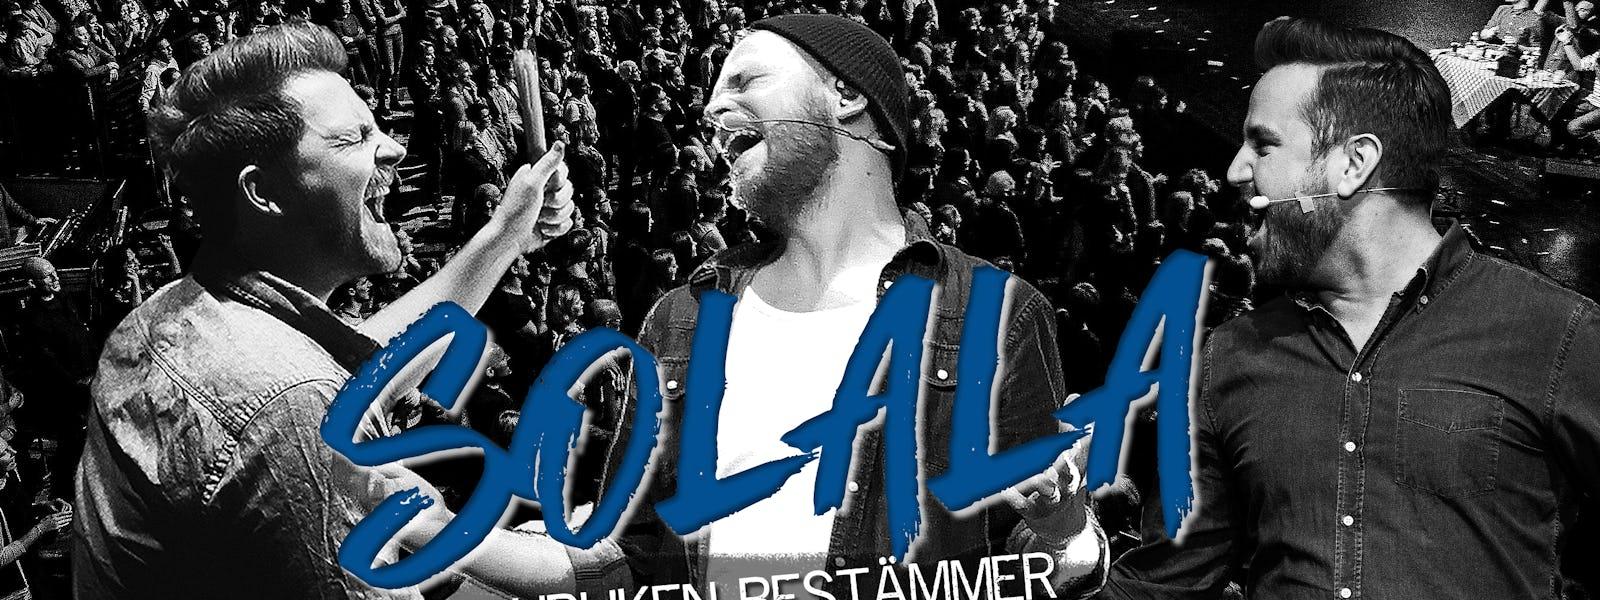 Bild - SOLALA – Publiken Bestämmer Tour 2020